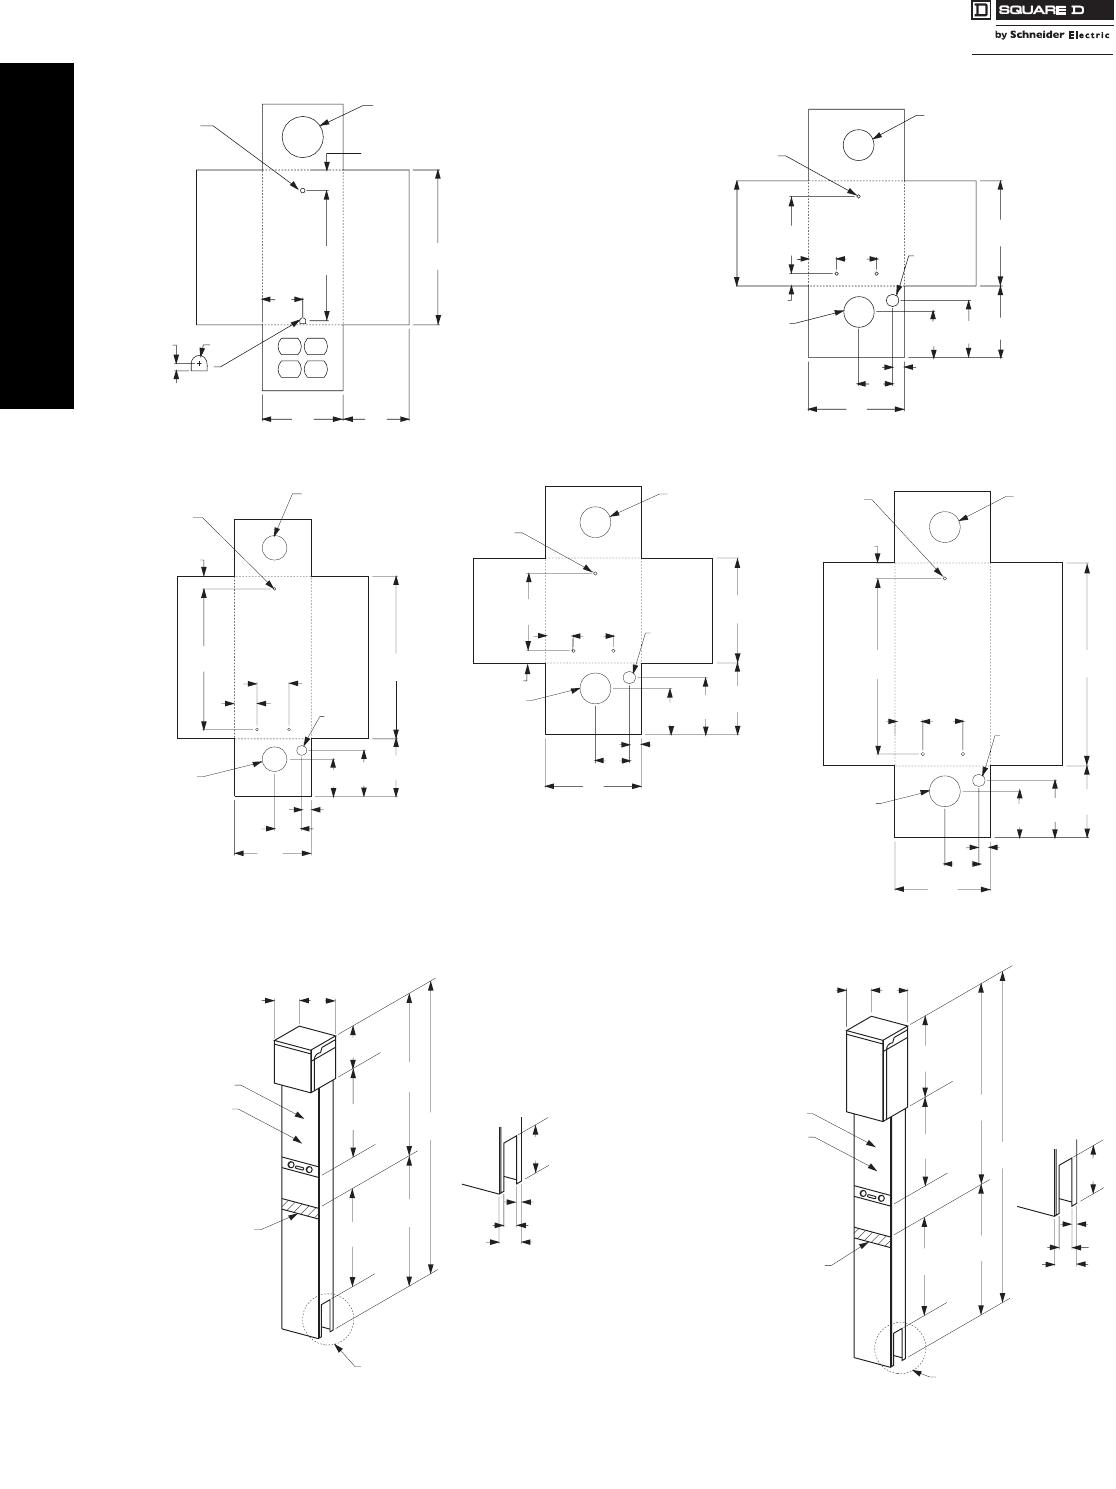 Schneider Electric Digest 175 Load Centers 141838 Catalog Square D Qo Qwikgard 20 Amp Twopole Gfci Breakerqo220gficp The Electricus